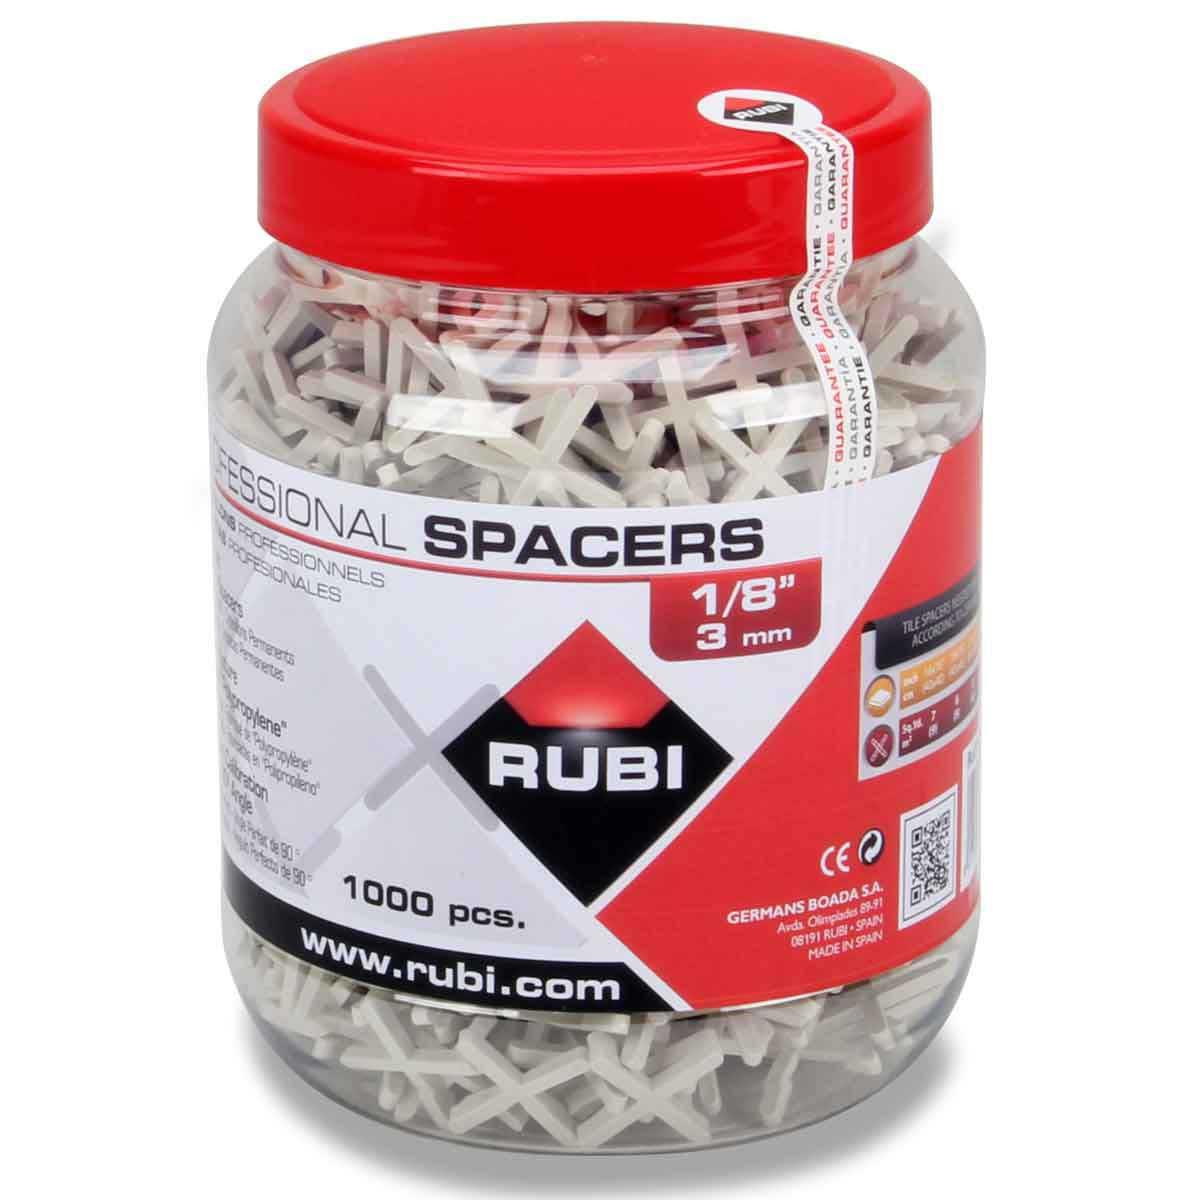 1/8th inch Rubi Leave-in Spacers Jars 02281